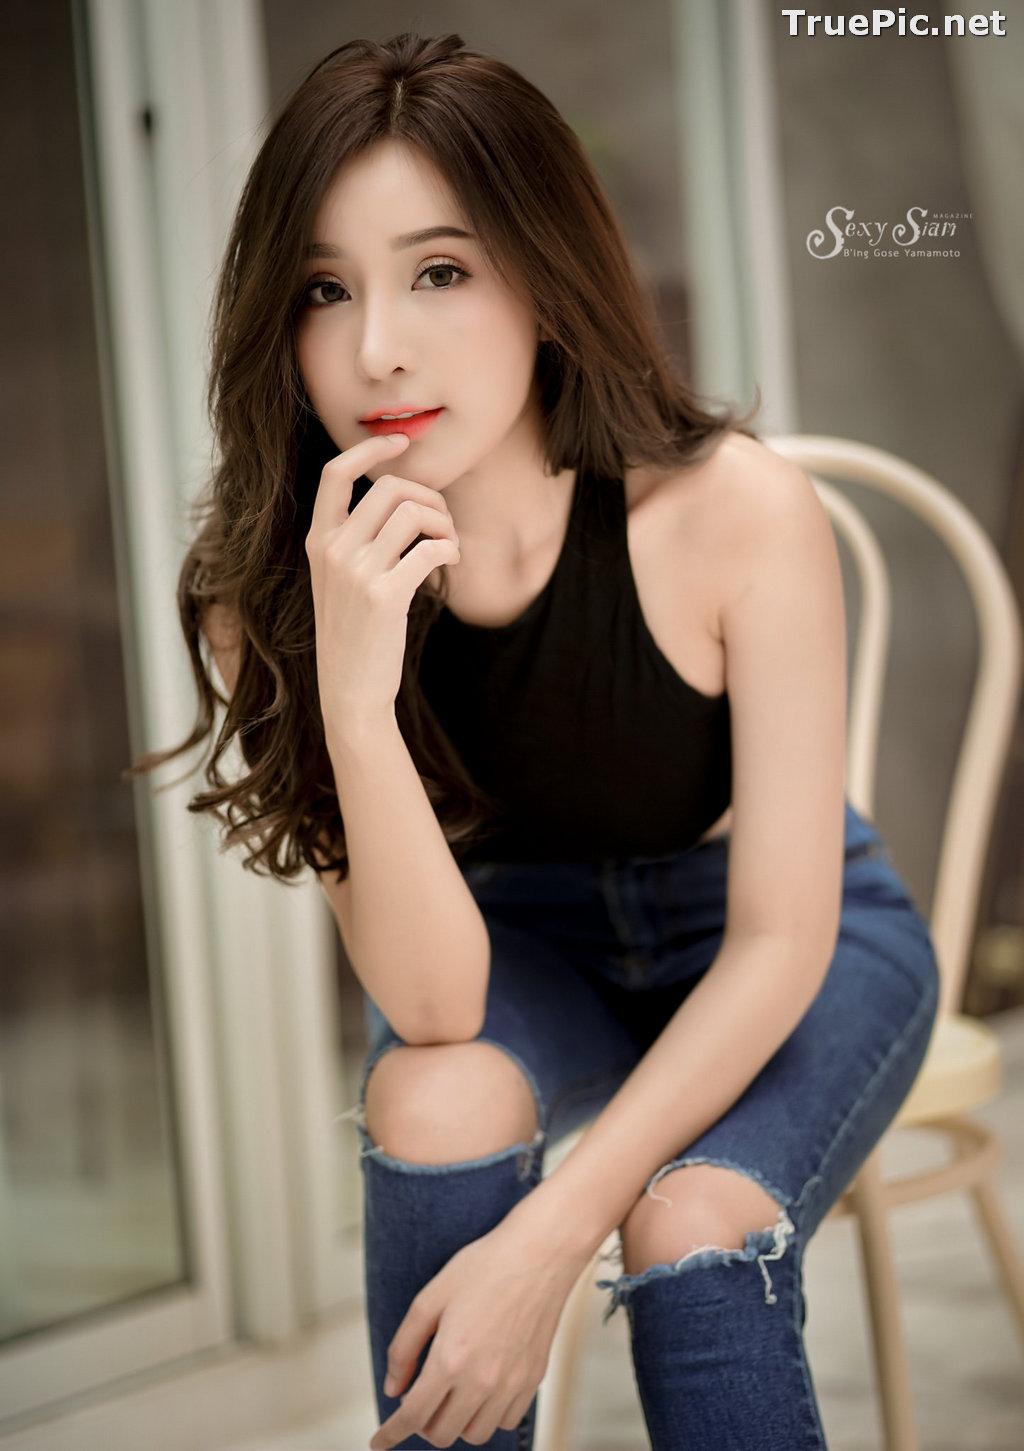 Image Thailand Model - Thanyarat Charoenpornkittada - Black Crop Top and Jean - TruePic.net - Picture-8